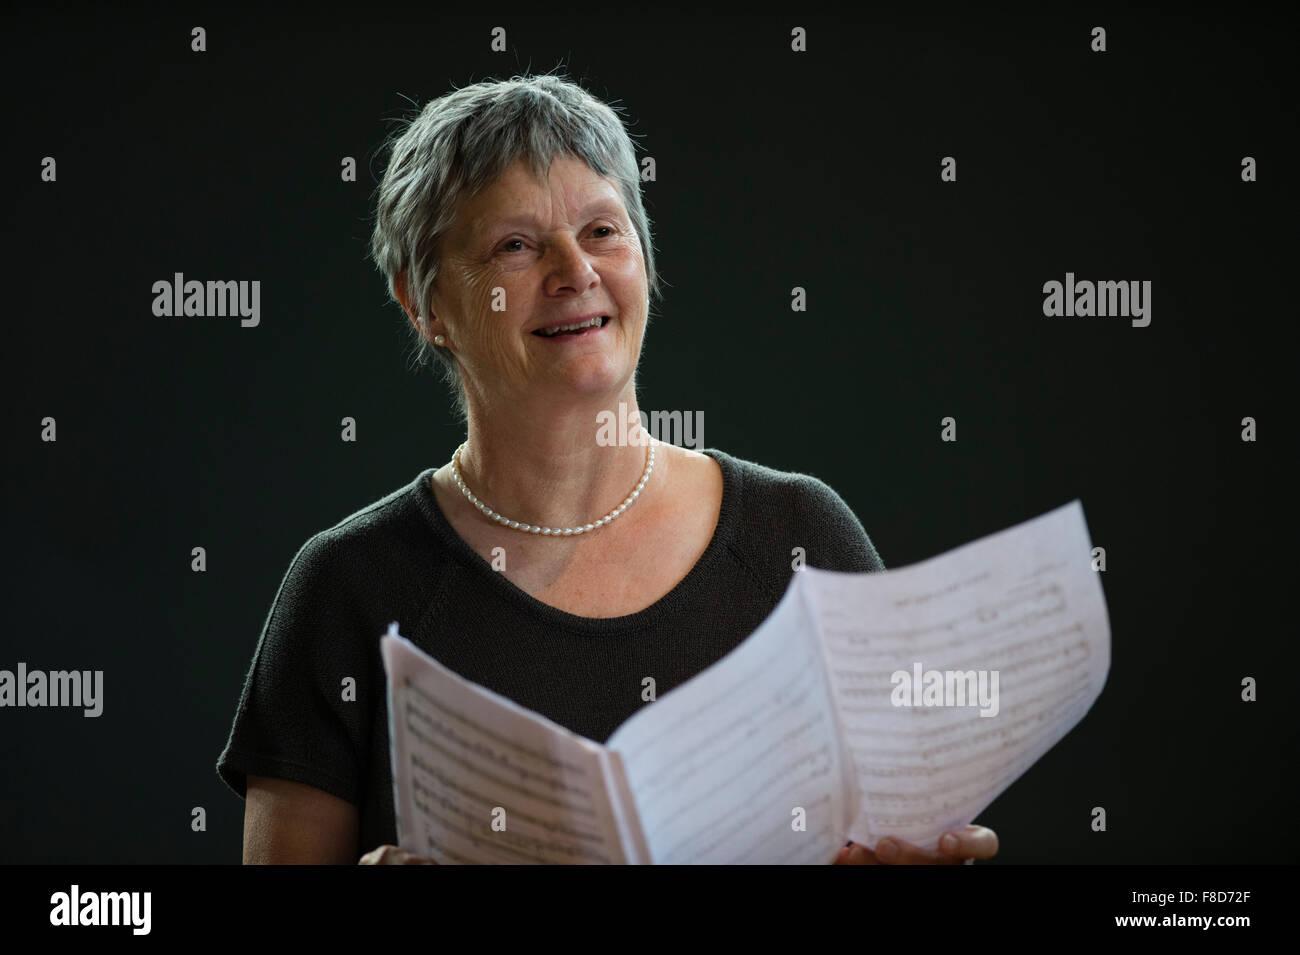 Liza Hobbs, vocal singing coach tutor music teacher at MusicFest Aberystwyth, 2015 - Stock Image